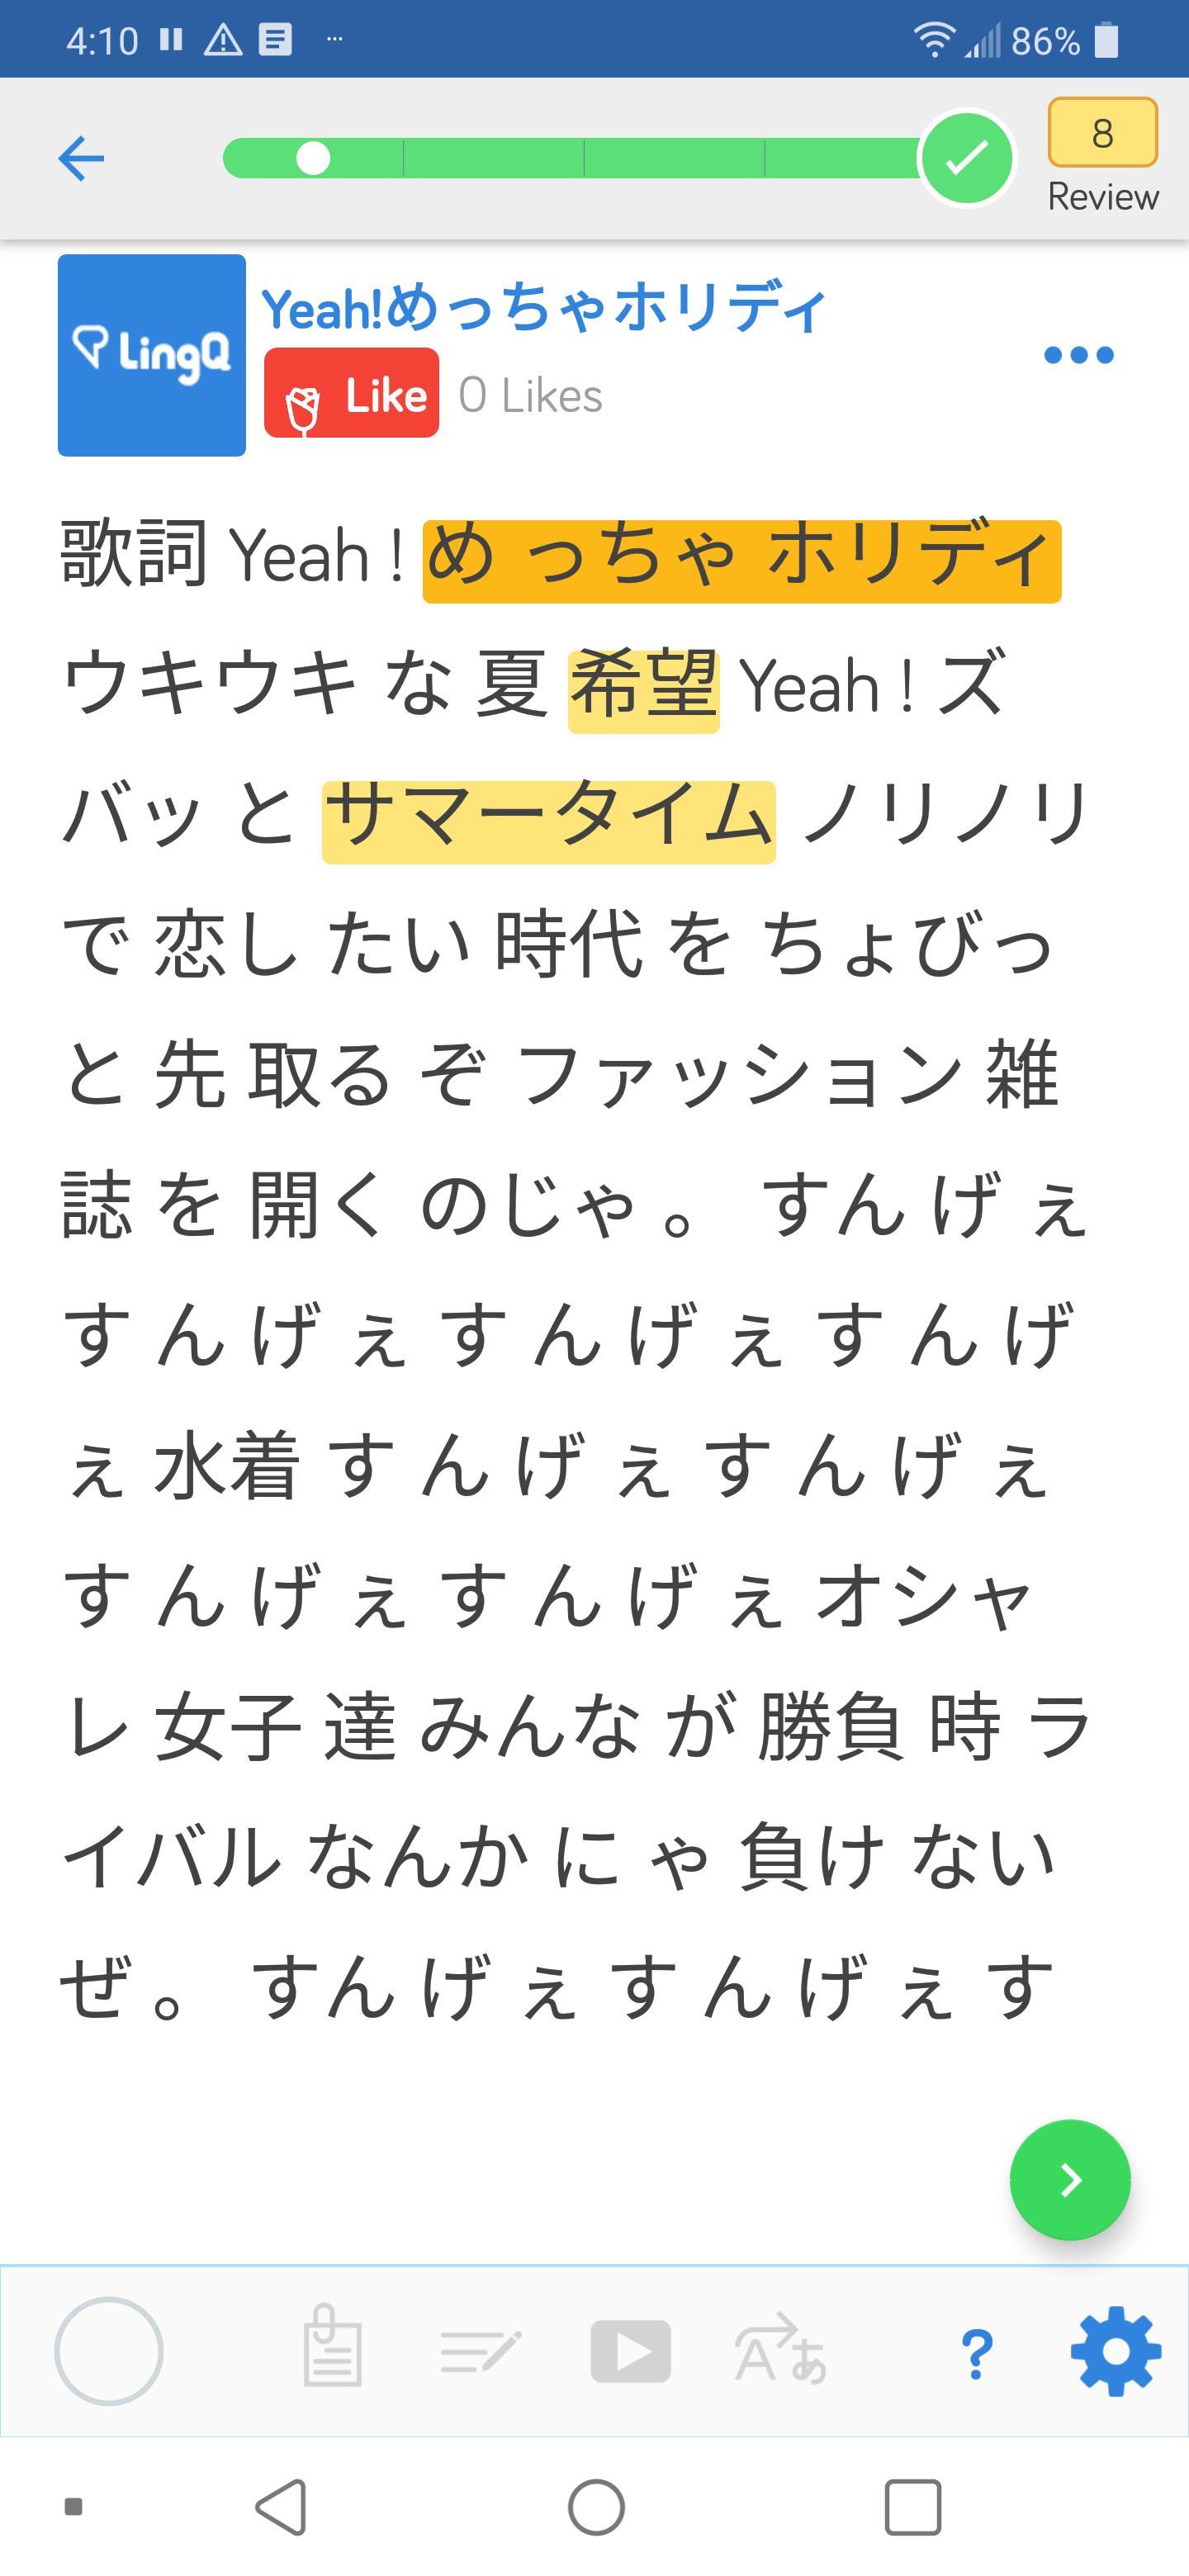 Meccha Uzai! 10 Japanese Slang Words You Should Know - LingQ Blog